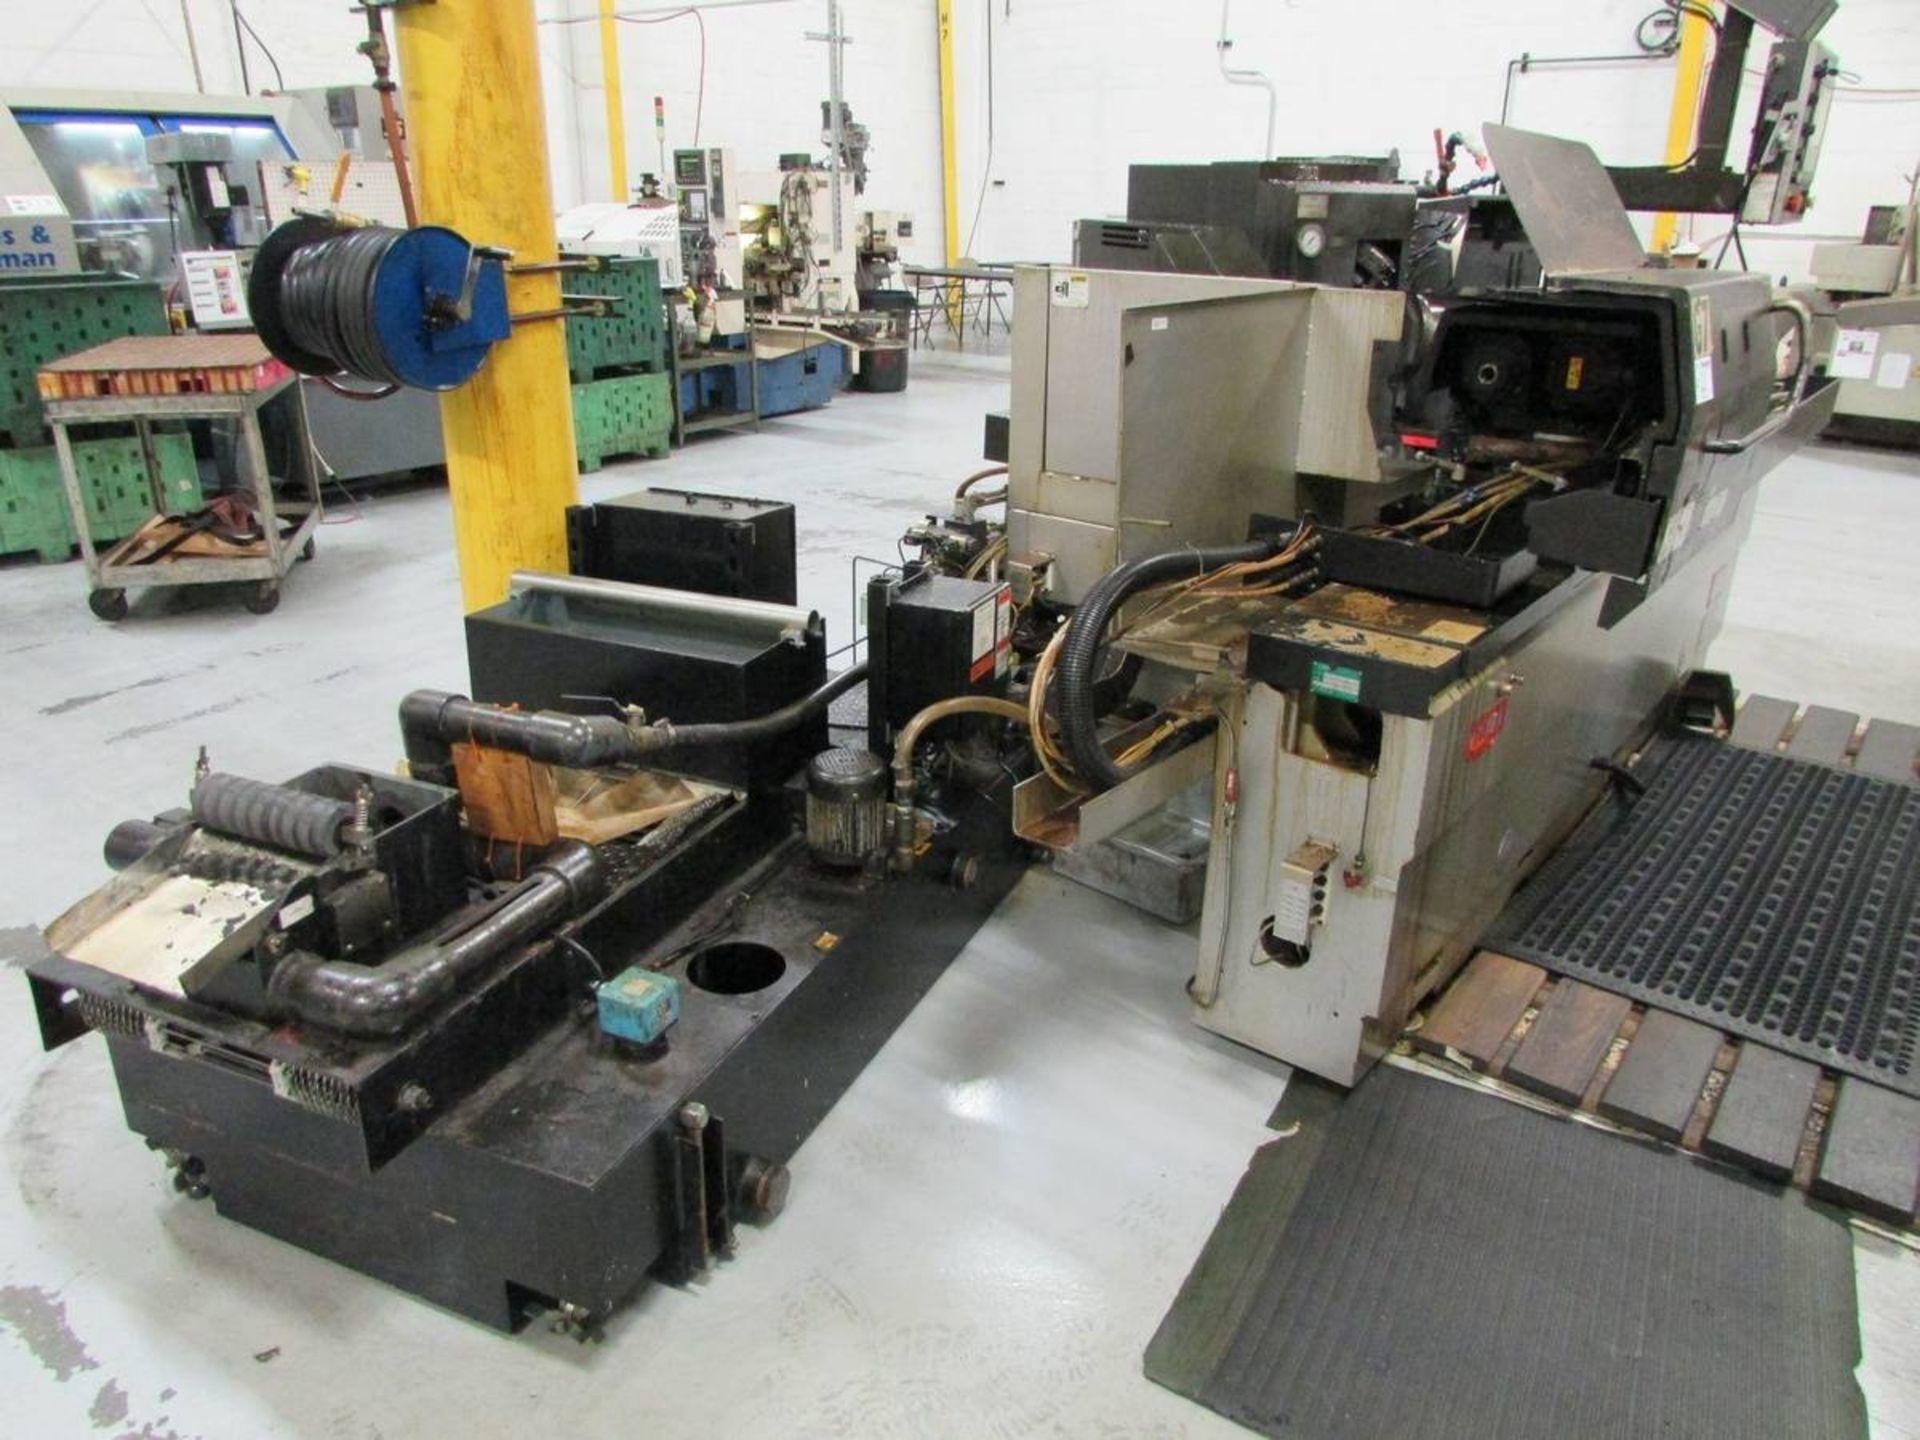 2012 Toyoda/ JTEKT 45m Select G II CNC OD Cylindrical Grinder - Image 10 of 21